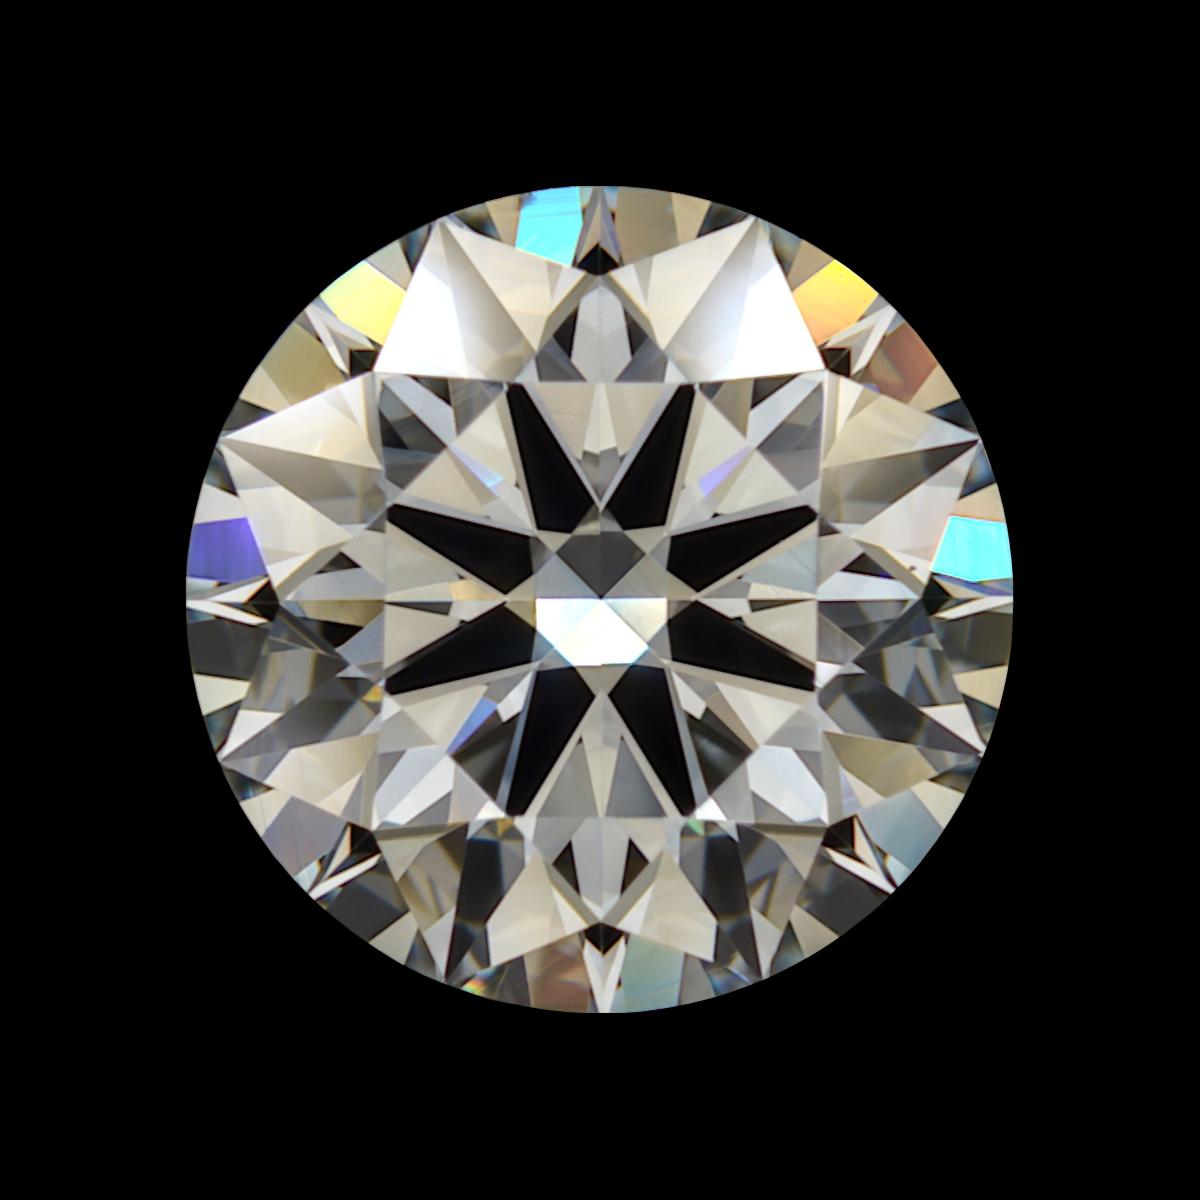 https://cdn.briangavindiamonds.com/files/mp4/BLAGS-104108734016/BLAGS-104108734016-Office-02.mp4